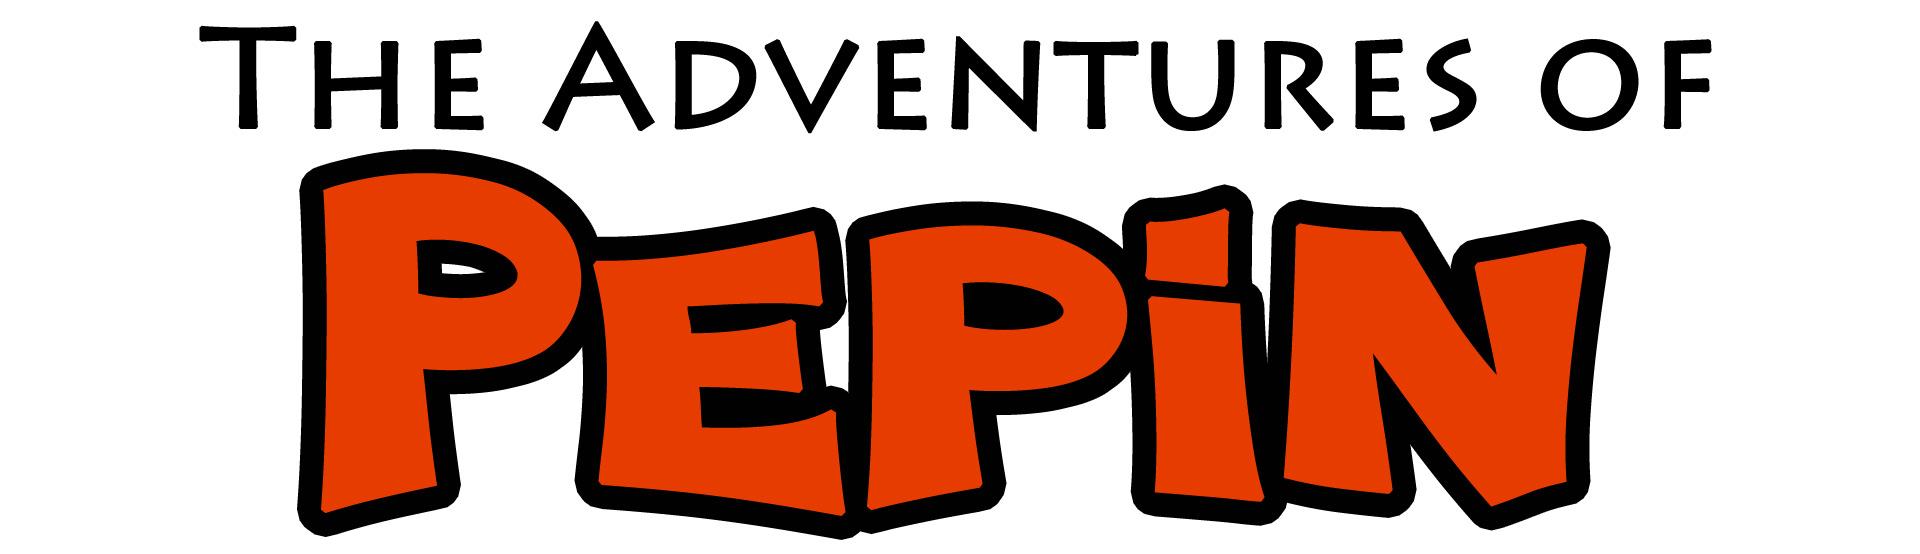 Adventures Of Pepin (Spanish)